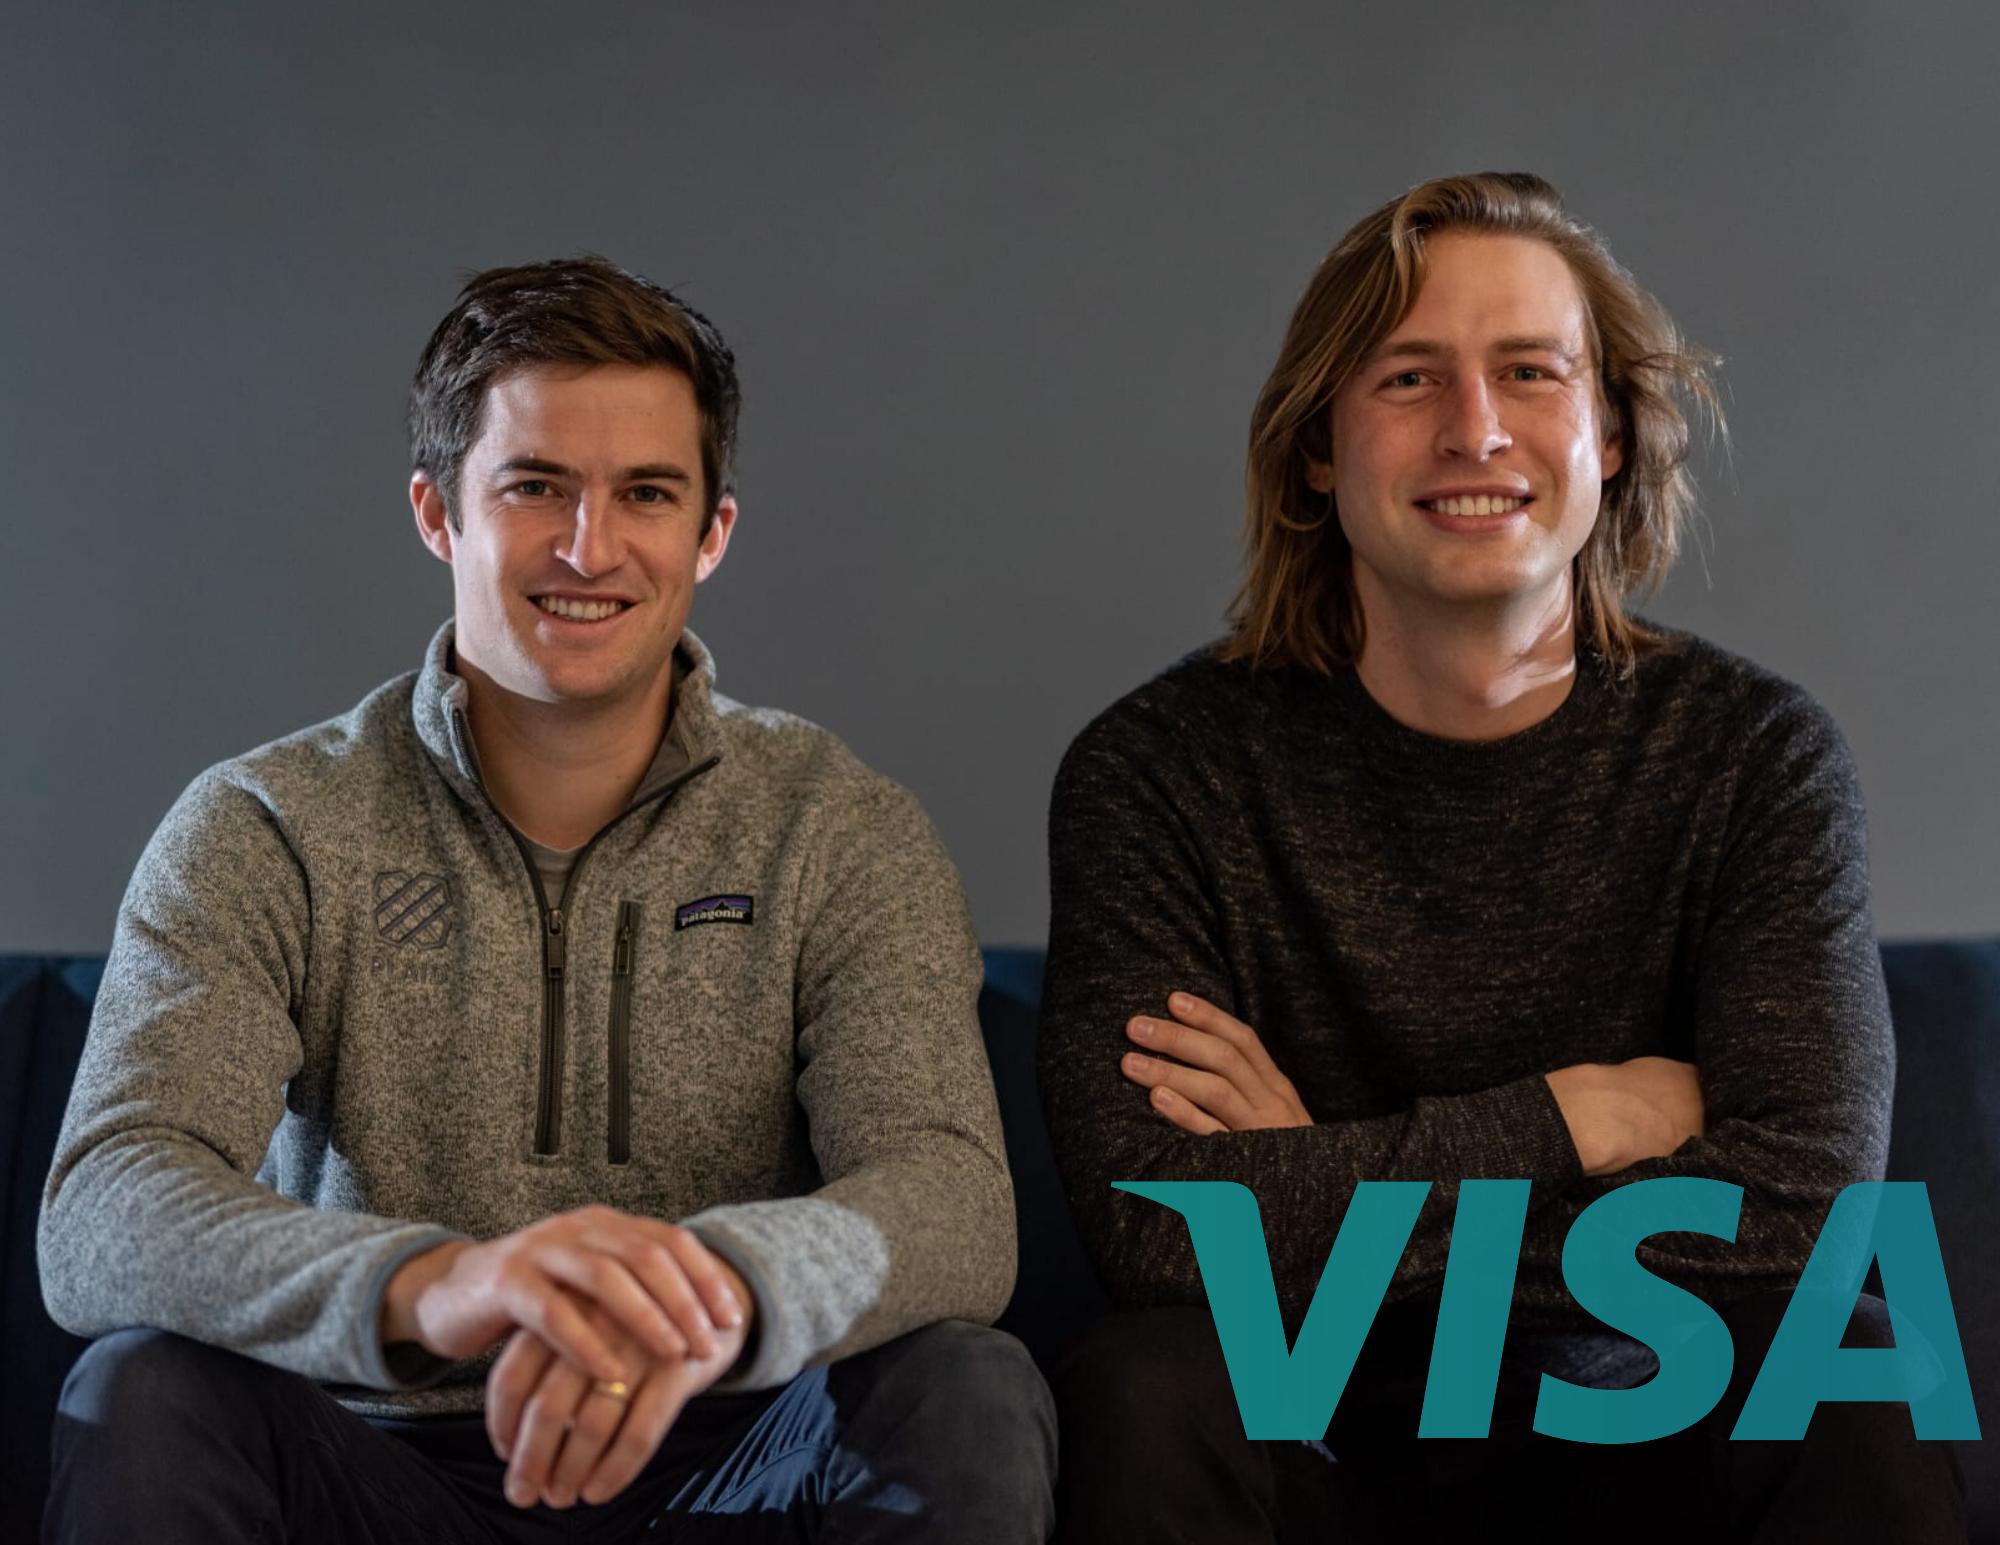 VISA's $5.3B Plaid Purchase Gets Canceled